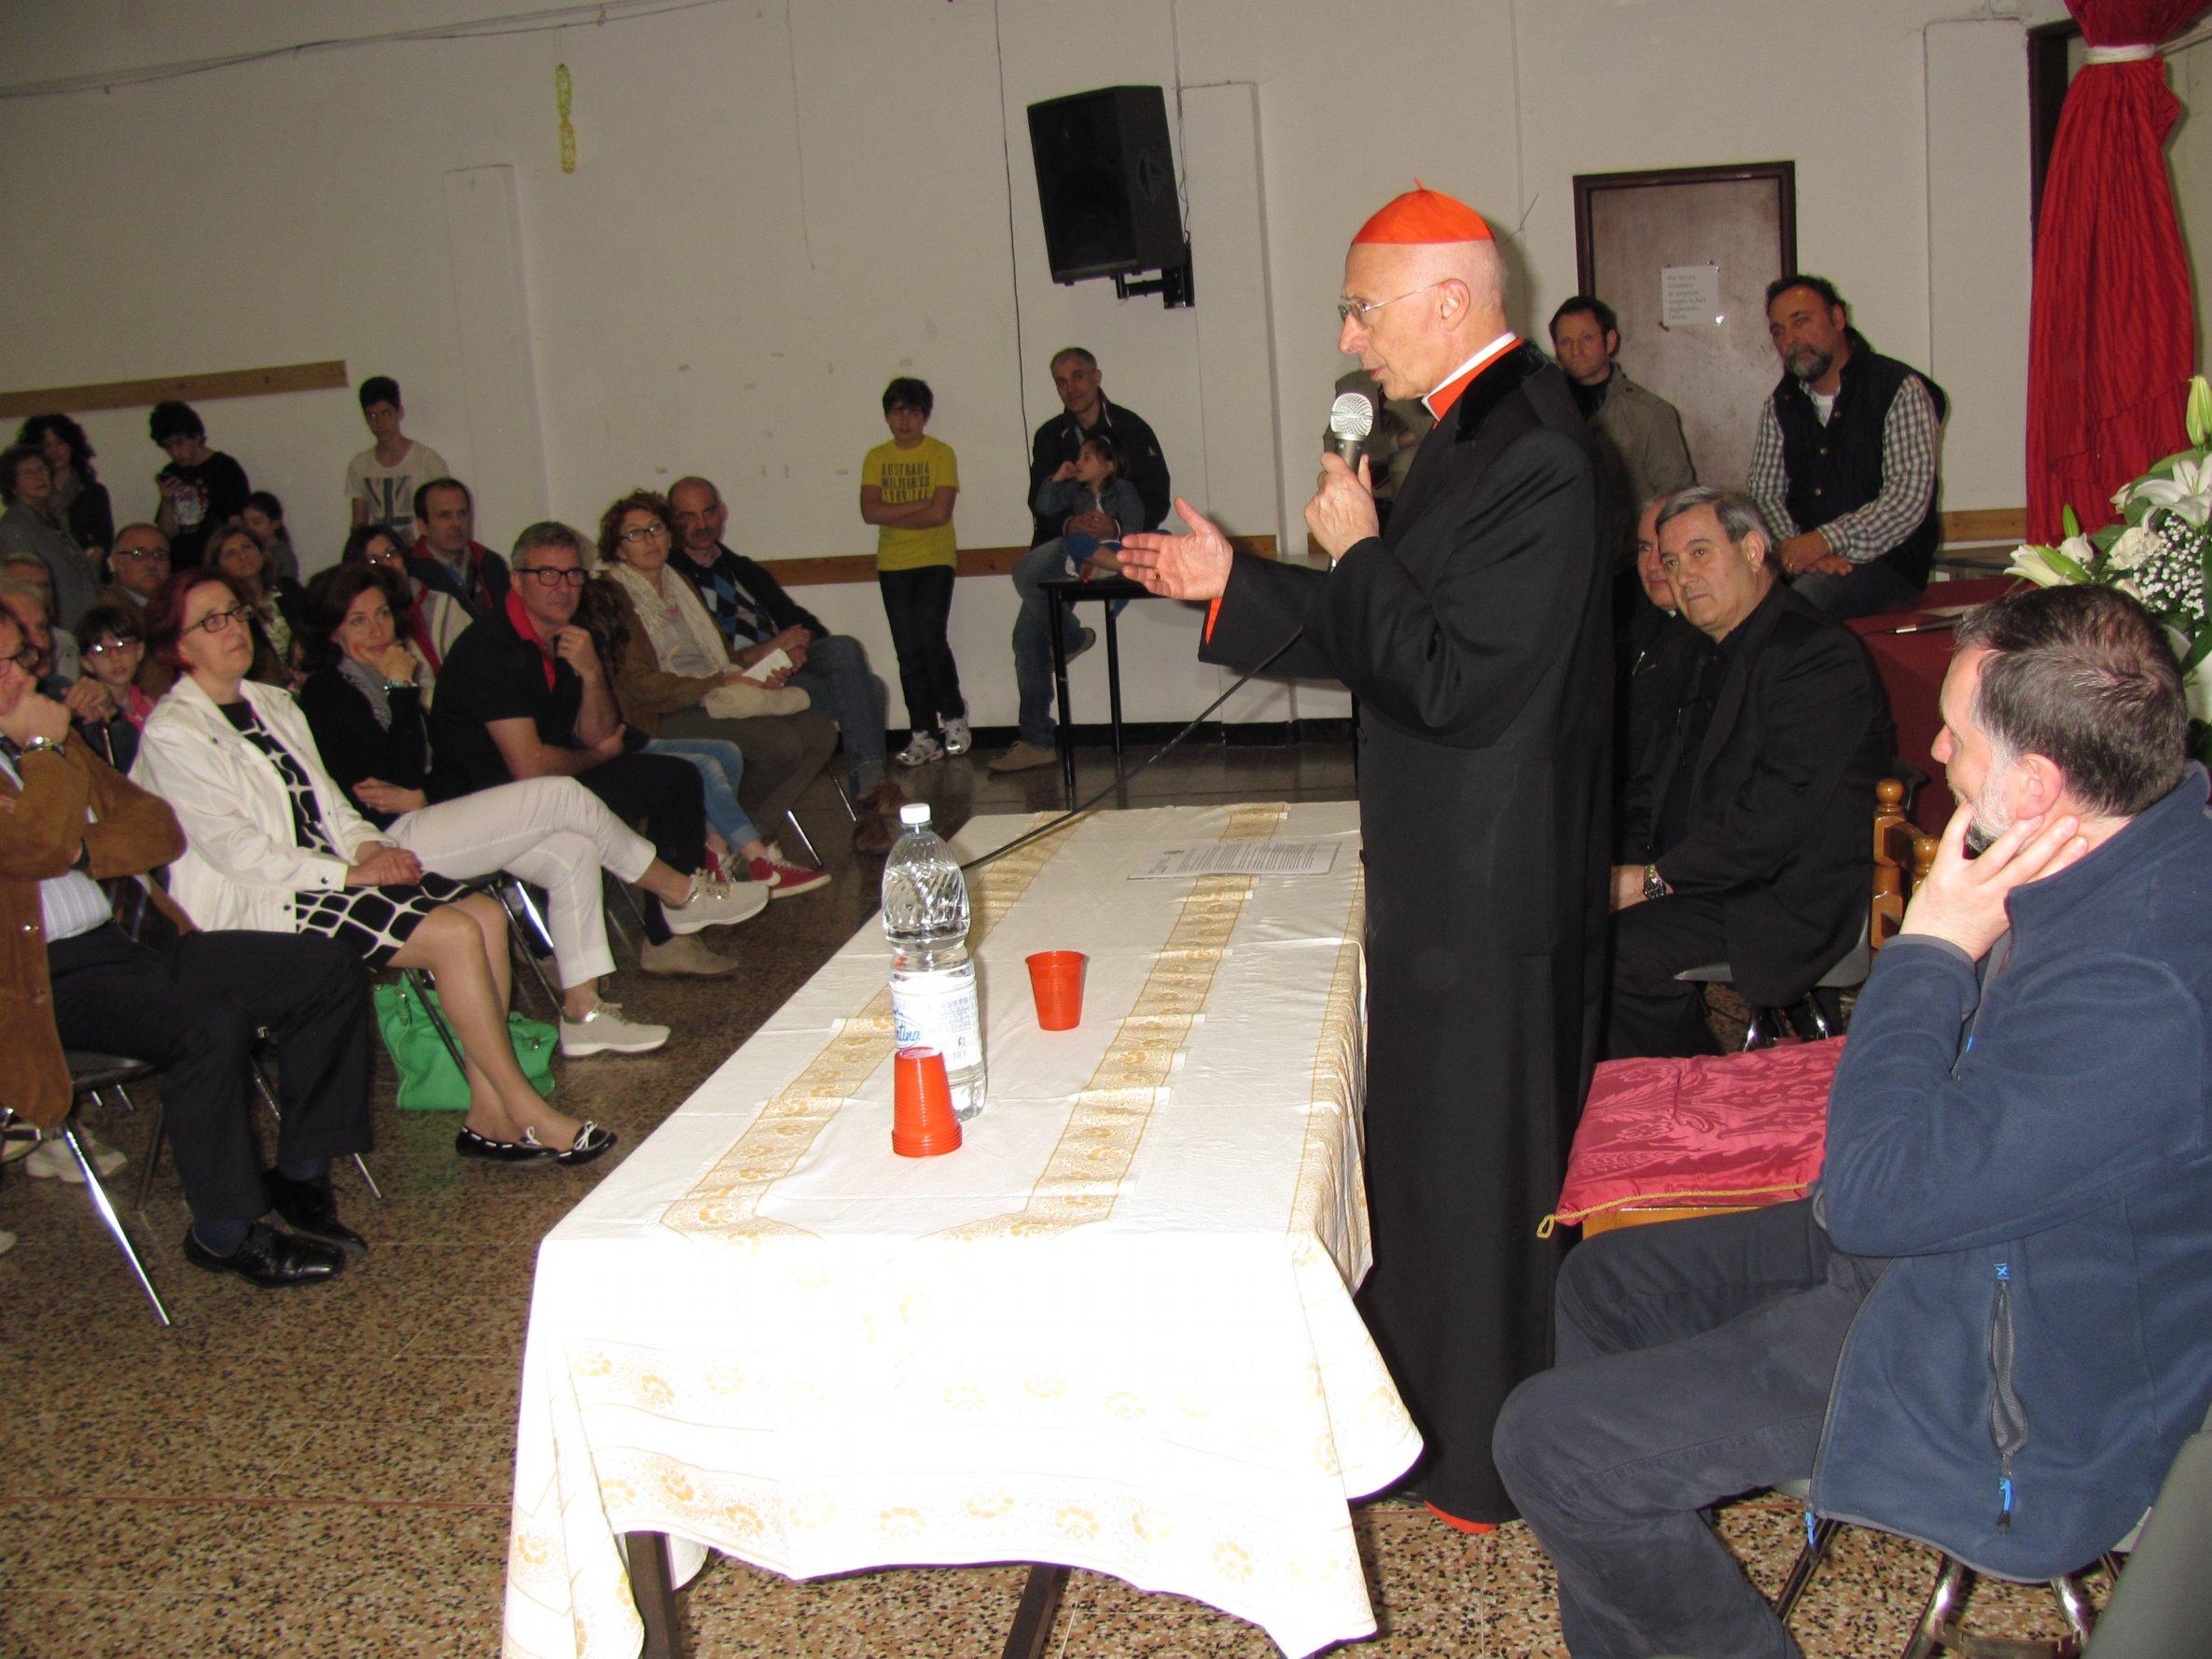 bagnasco_e_famiglie_vicariato_2013-05-26-14-45-53